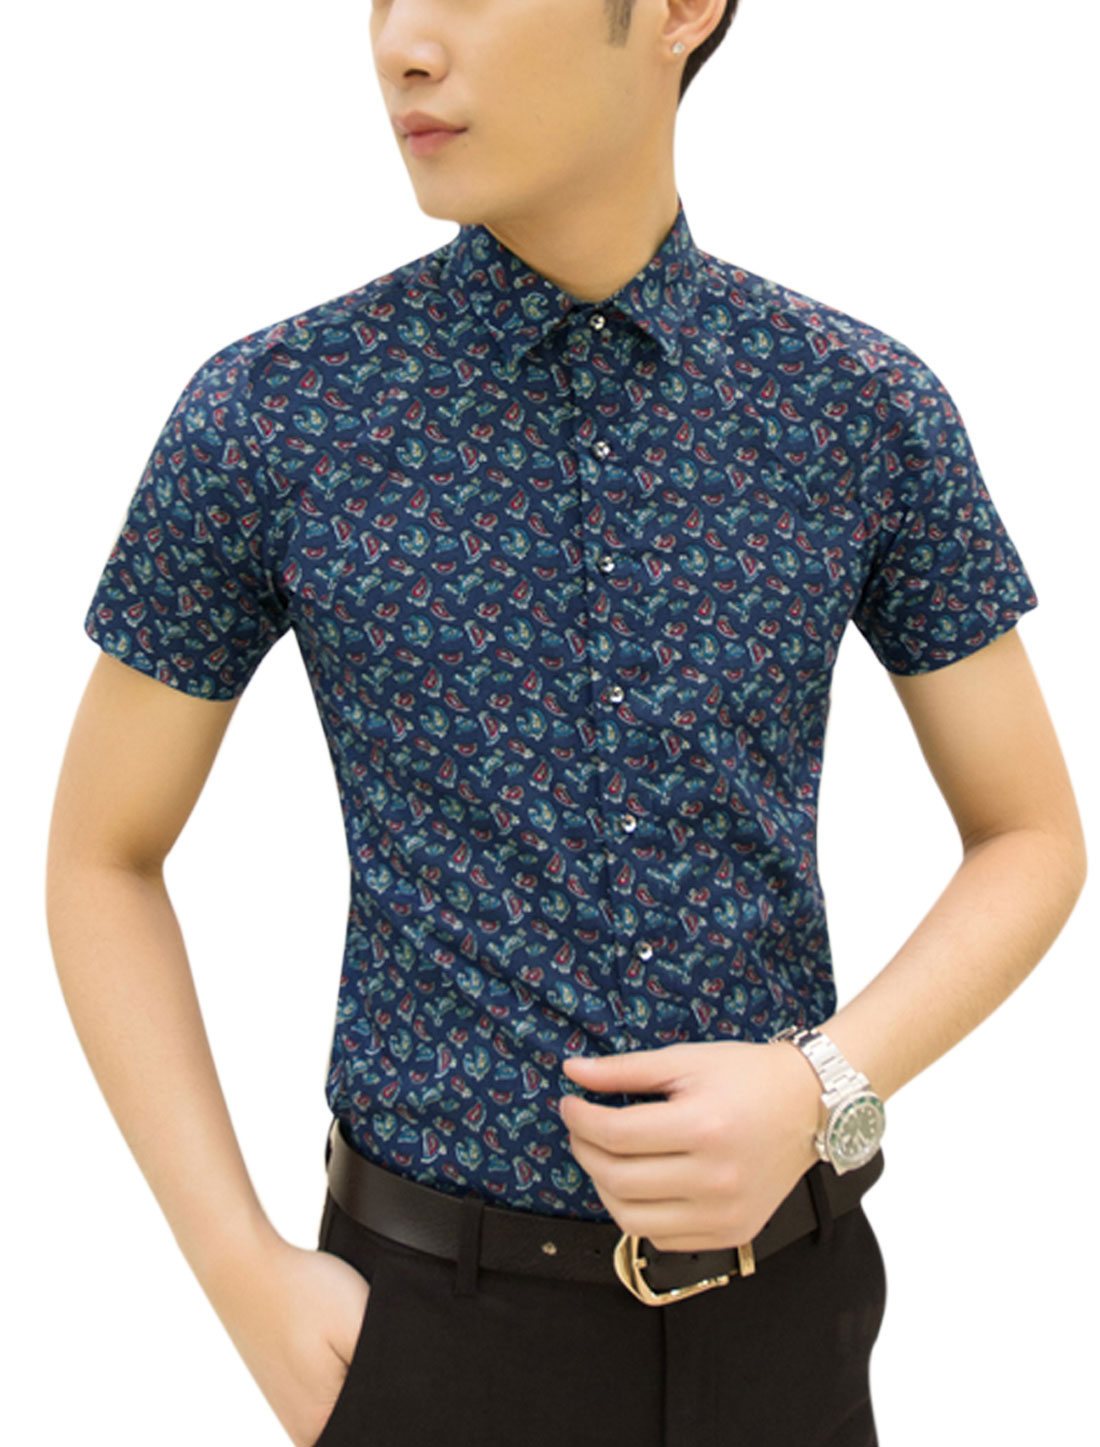 Man Paisley Pattern Point Collar Button Closure Leisure Shirt Navy Blue M